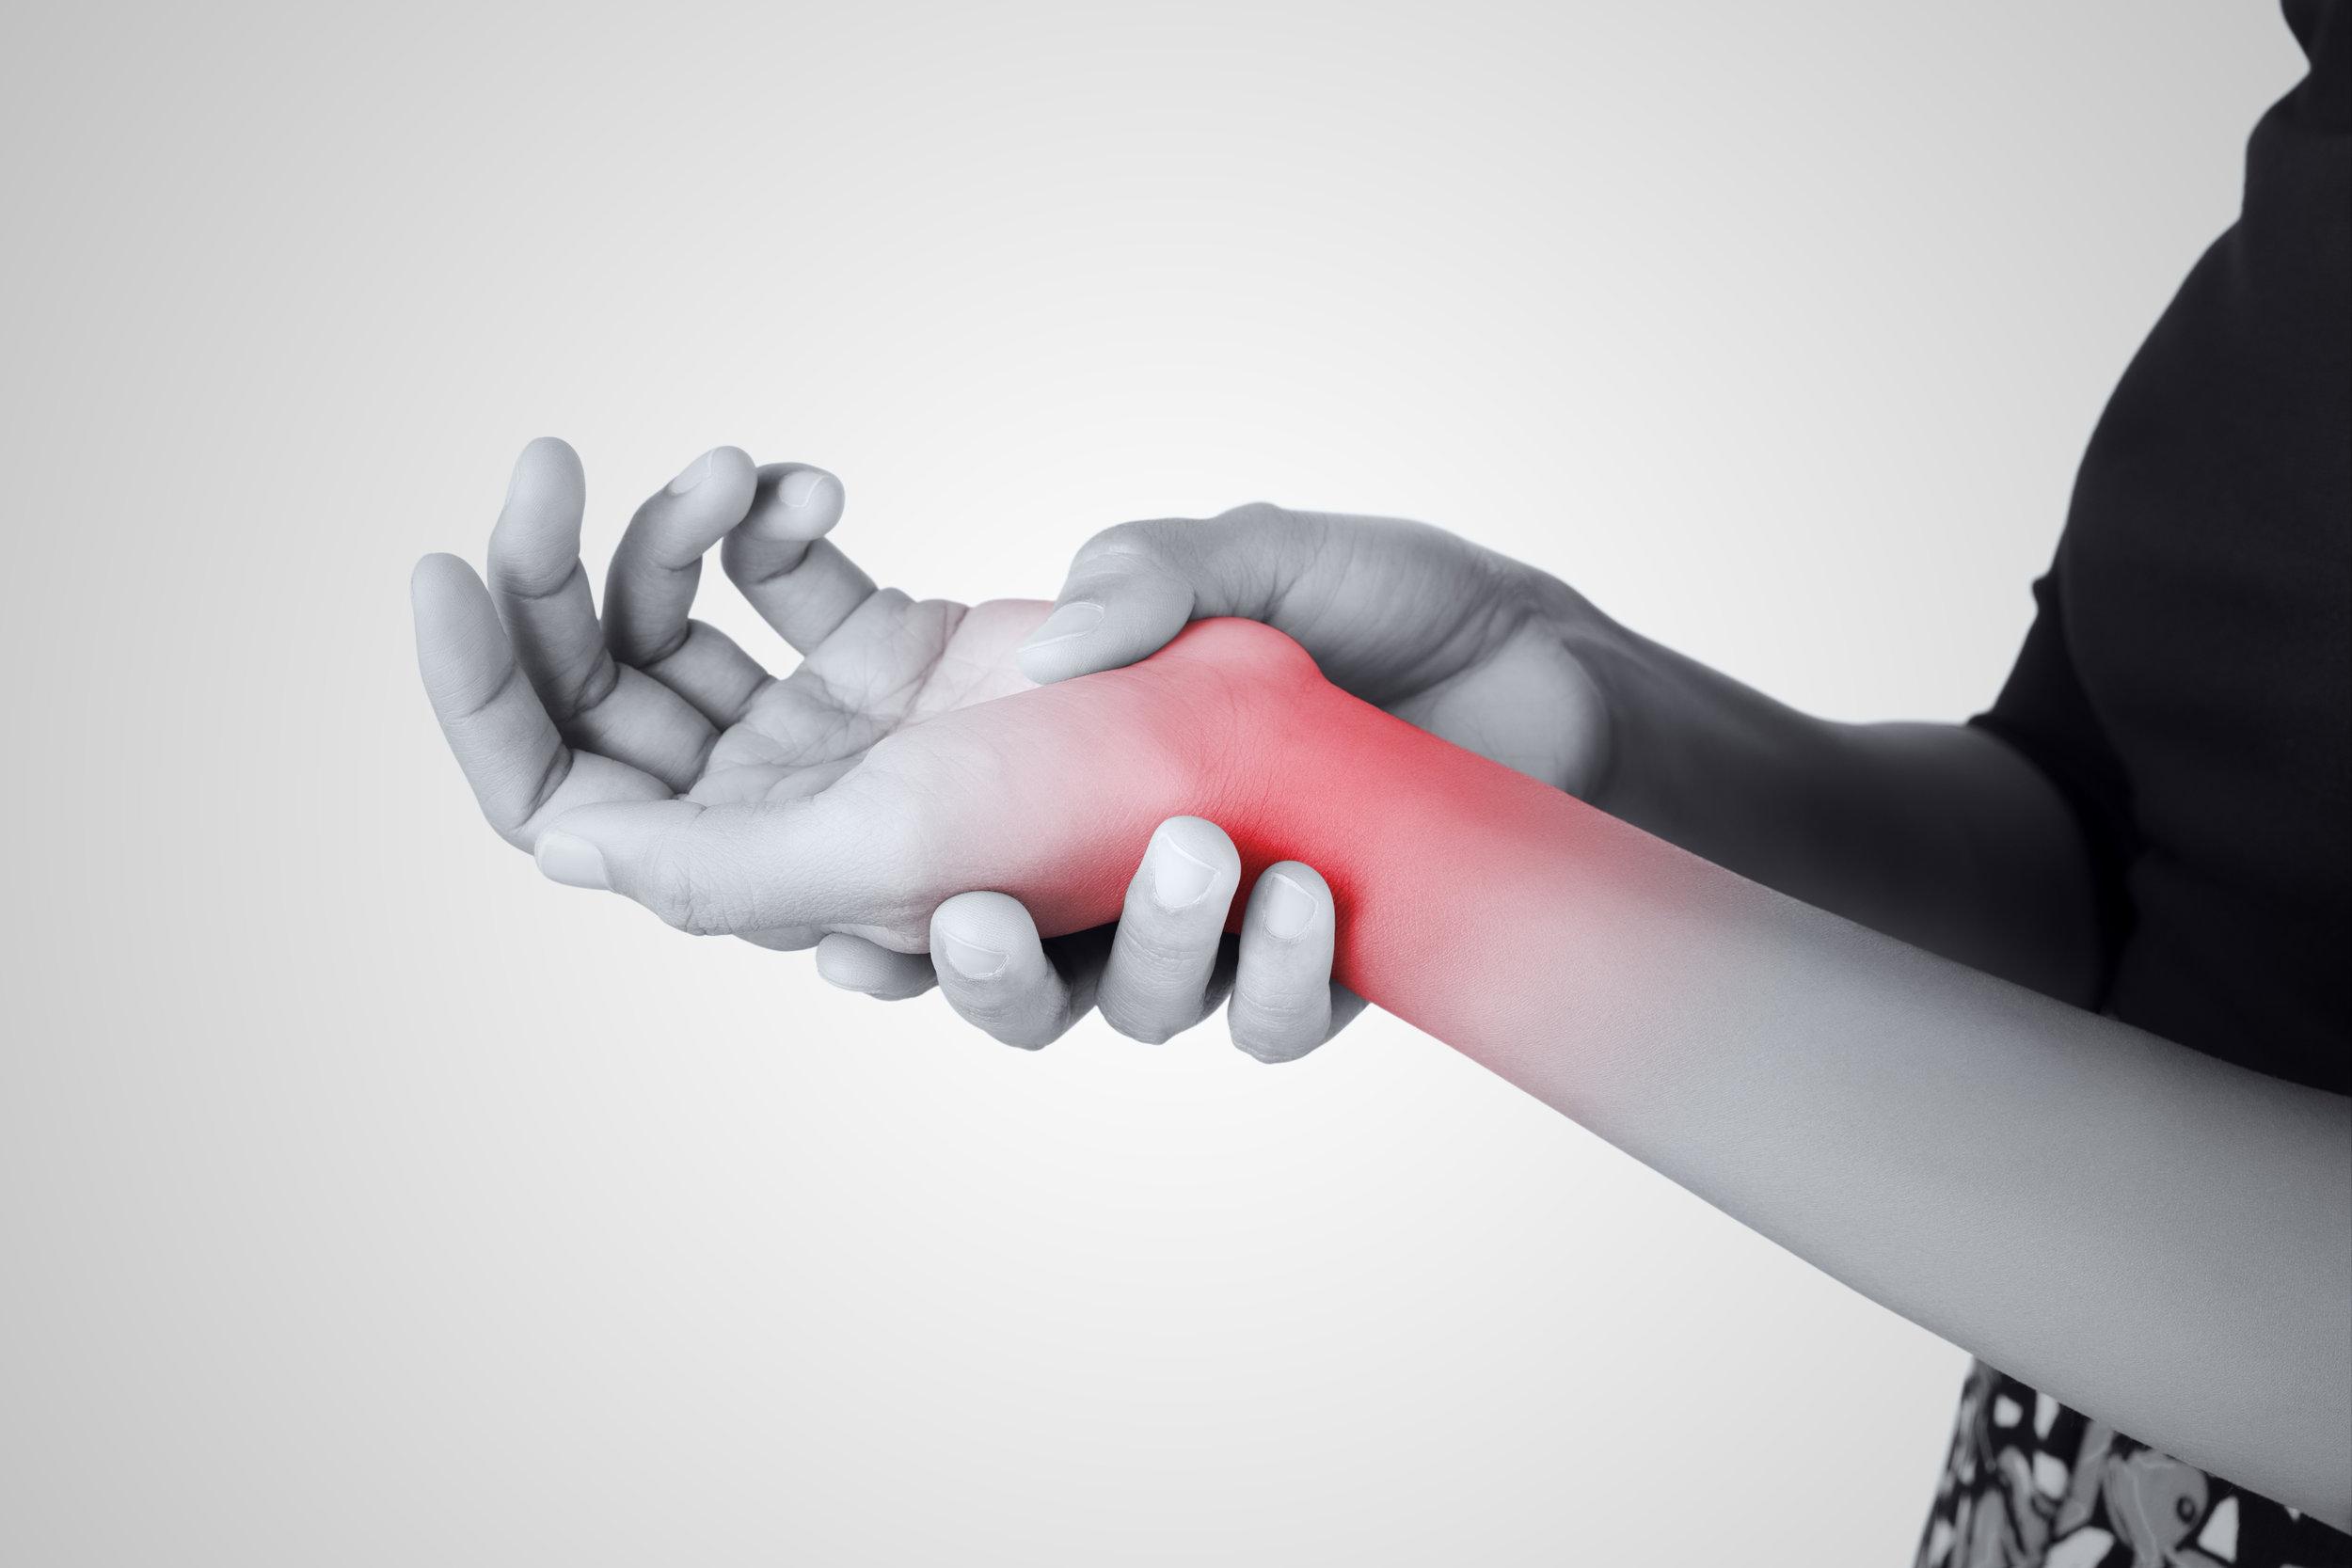 broken wrist.jpg